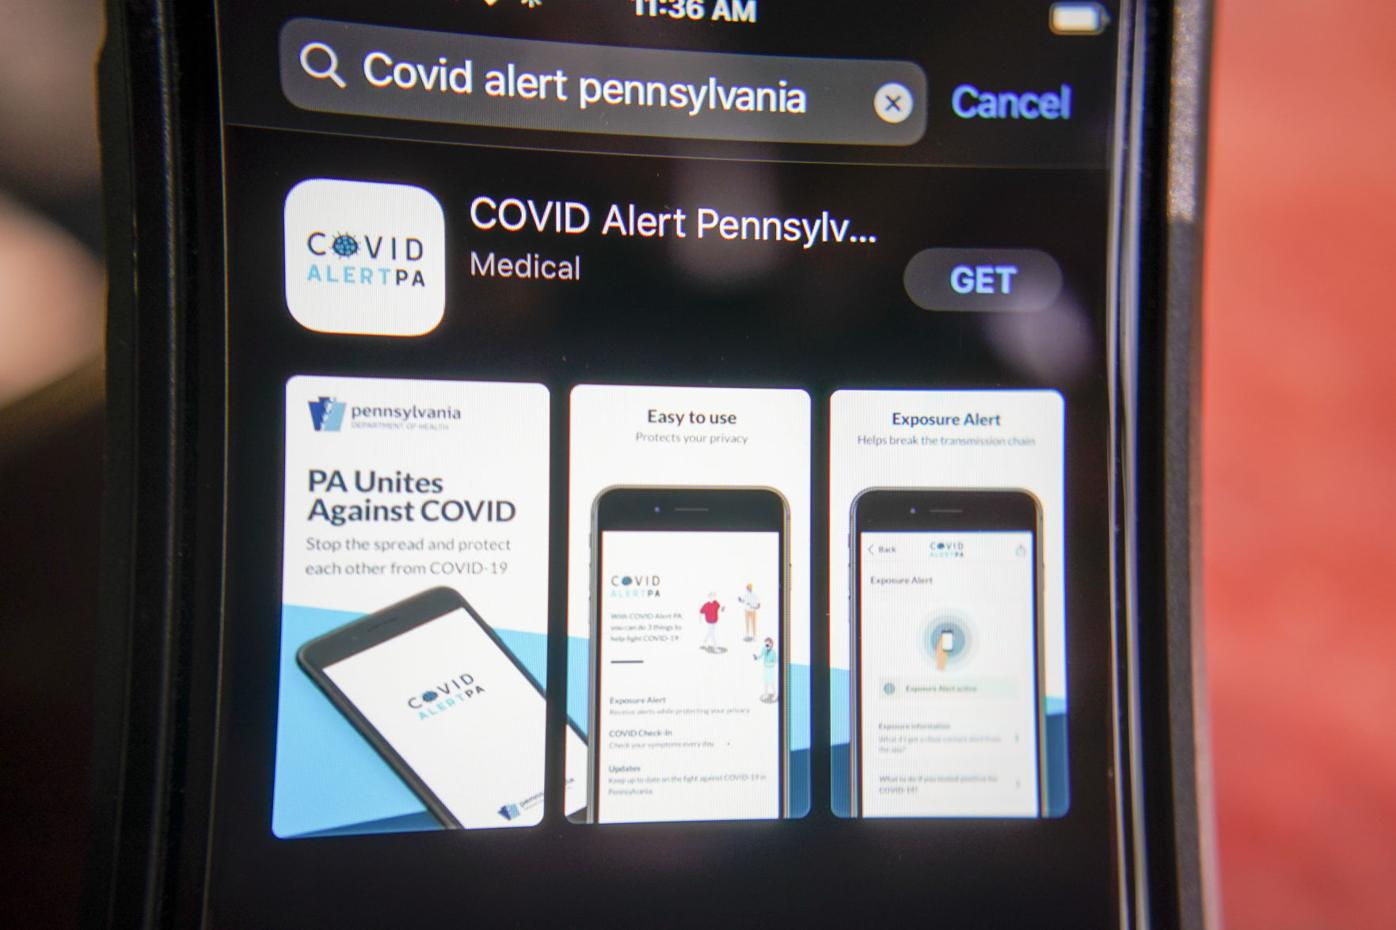 Virus Outbreak Pennsylvania App